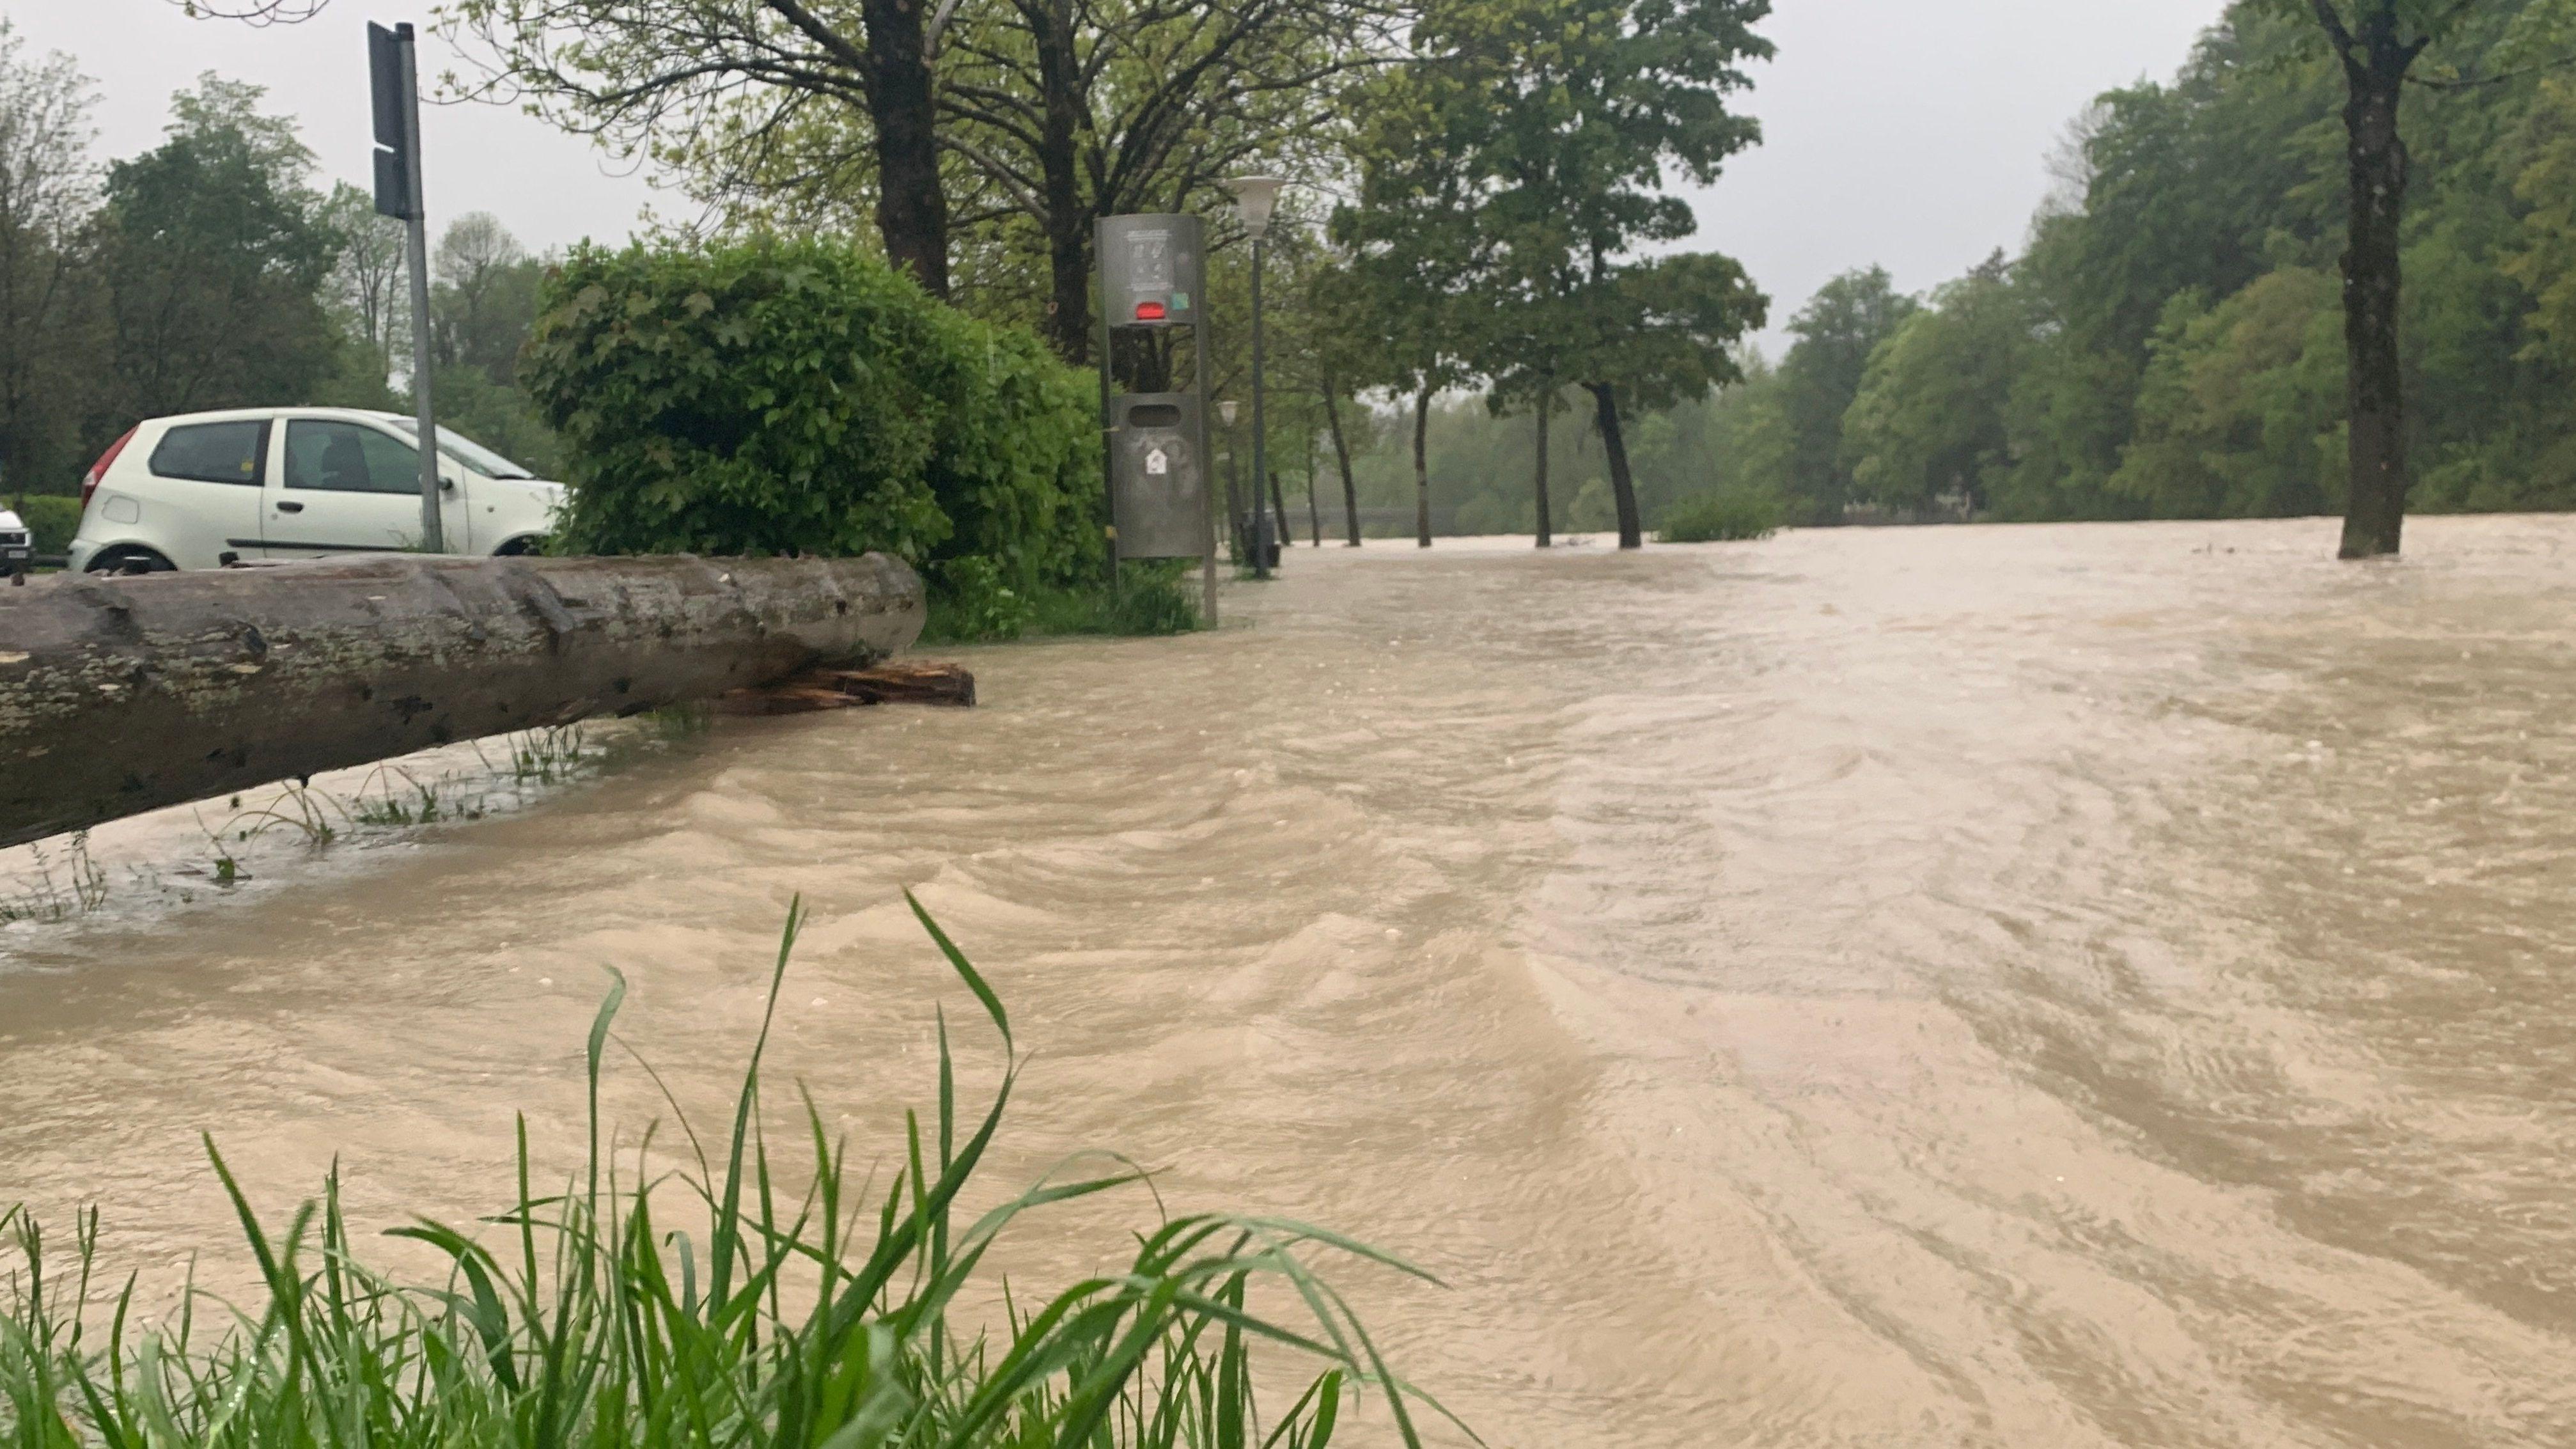 Überfluteter Parkplatz bei Bad Tölz